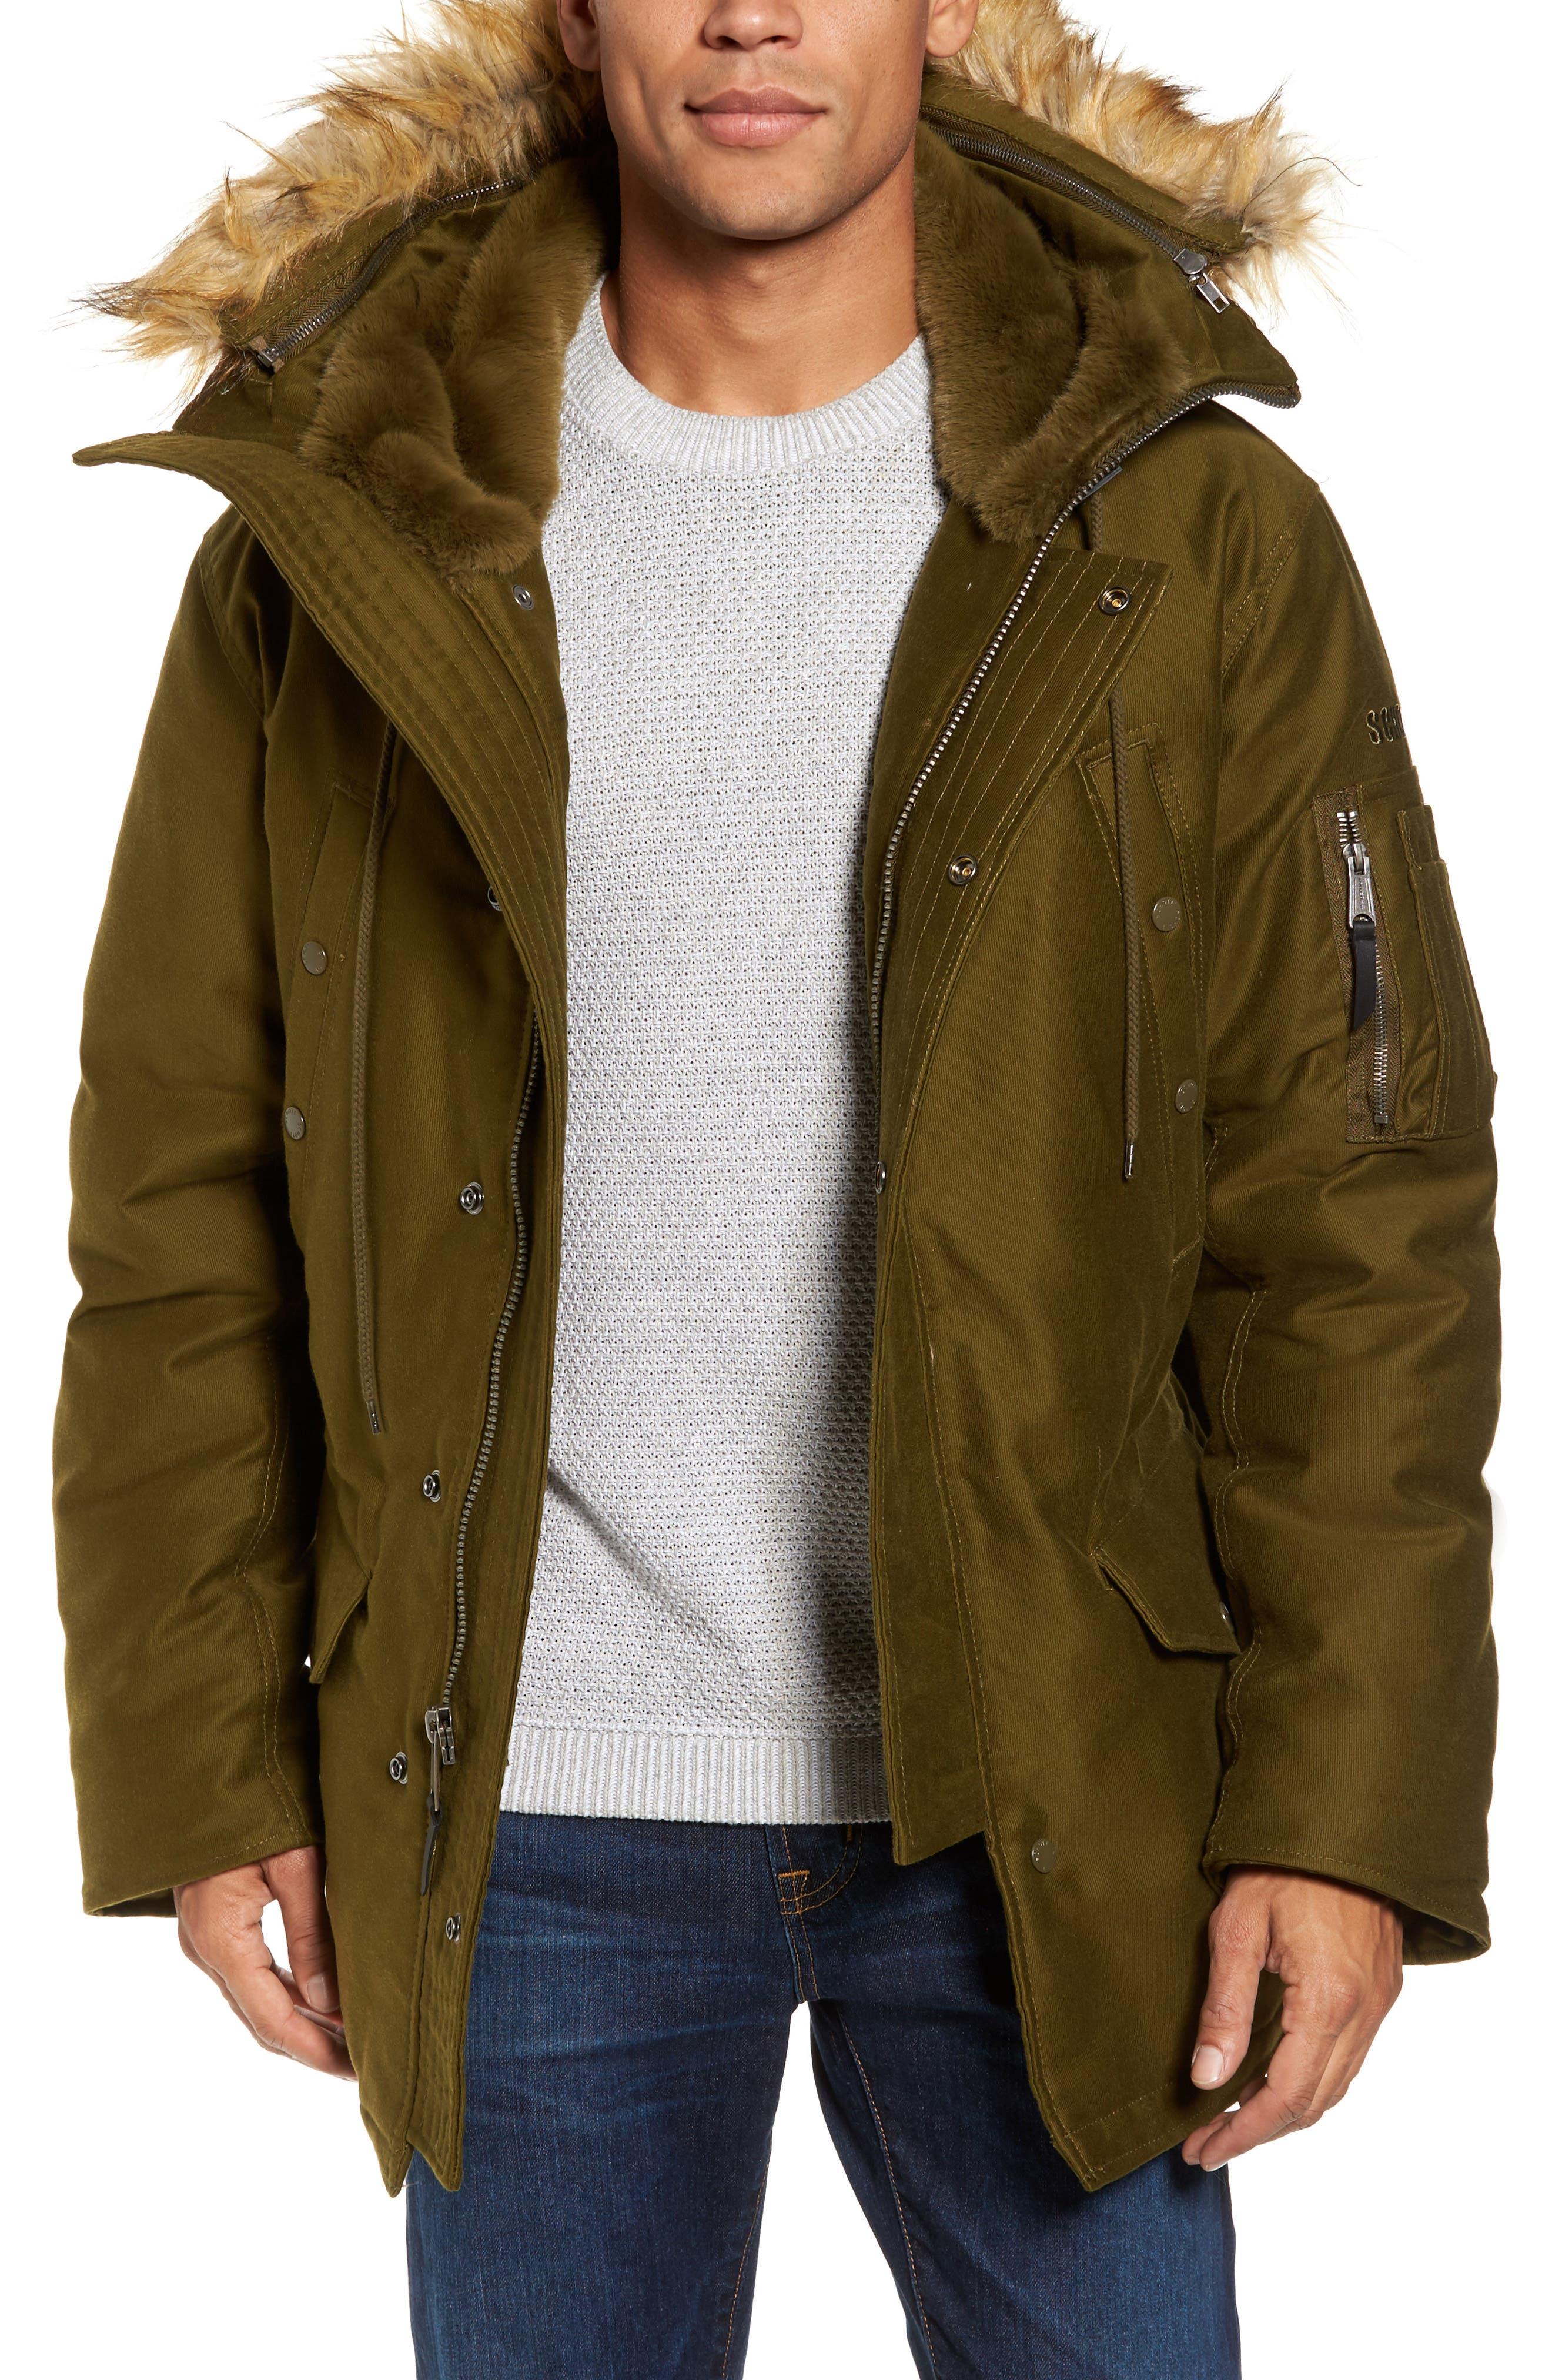 Bedford Corduroy Goose Down Jacket with Faux Fur Trim,                         Main,                         color, 352